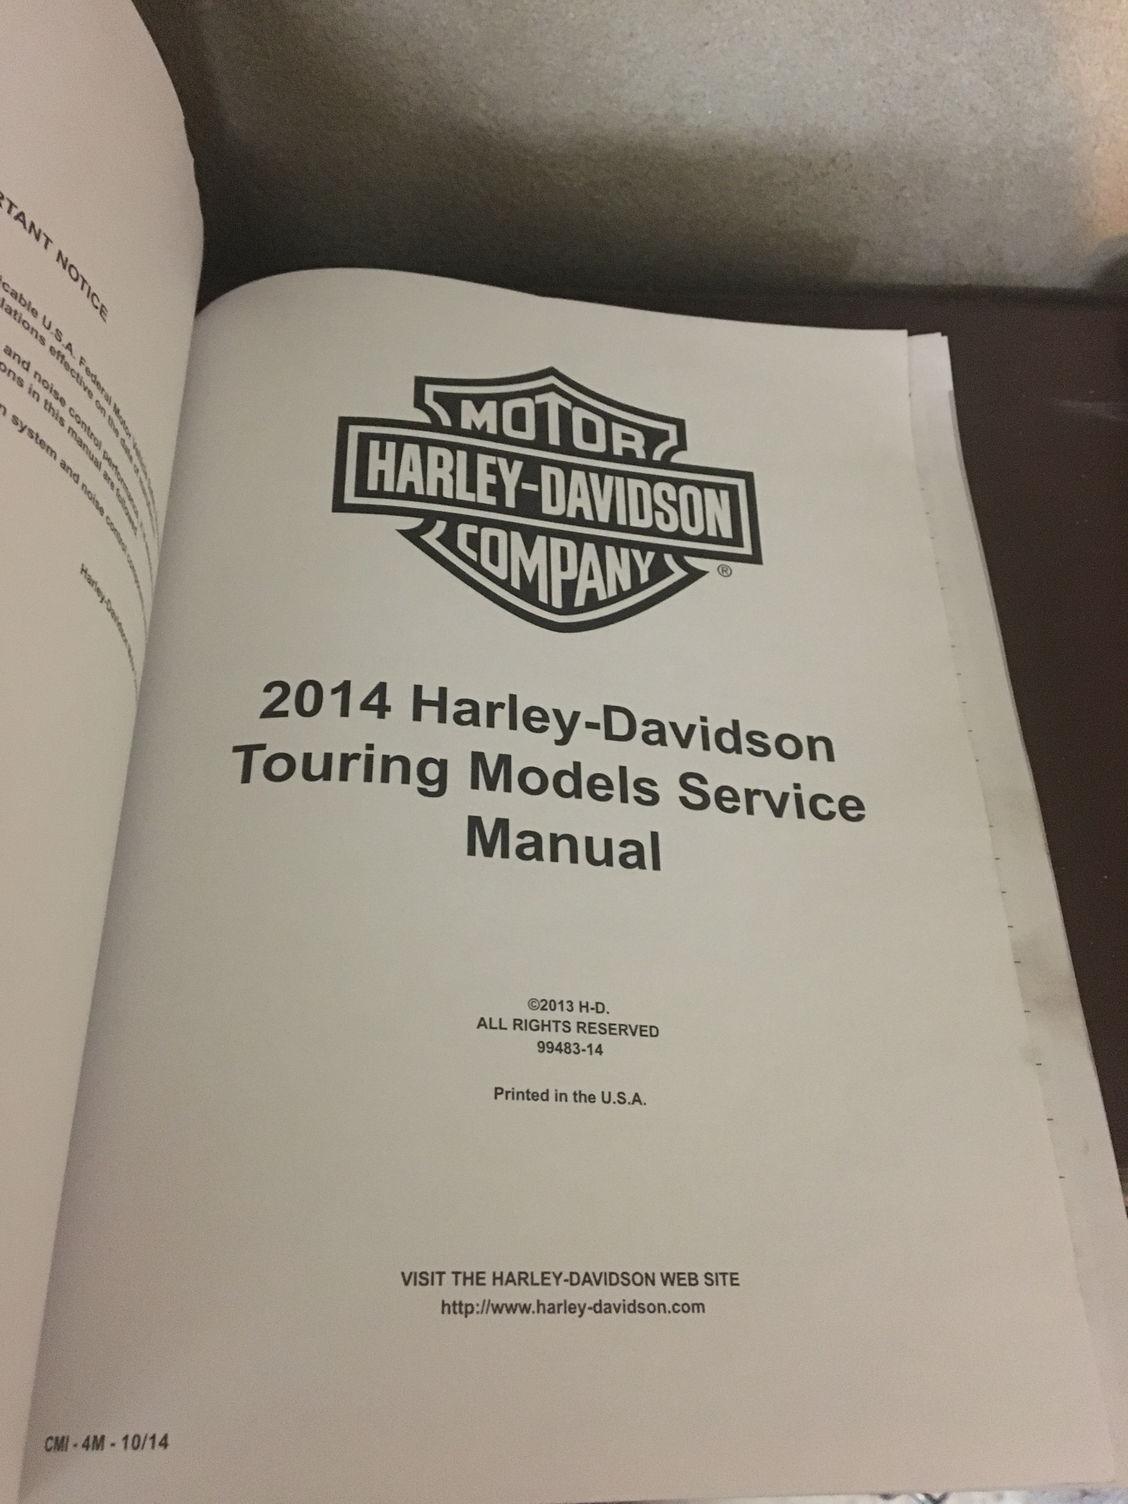 2014 touring service manual harley davidson forums rh hdforums com harley davidson 2014 touring models service manual.pdf Harley-Davidson Touring Bikes